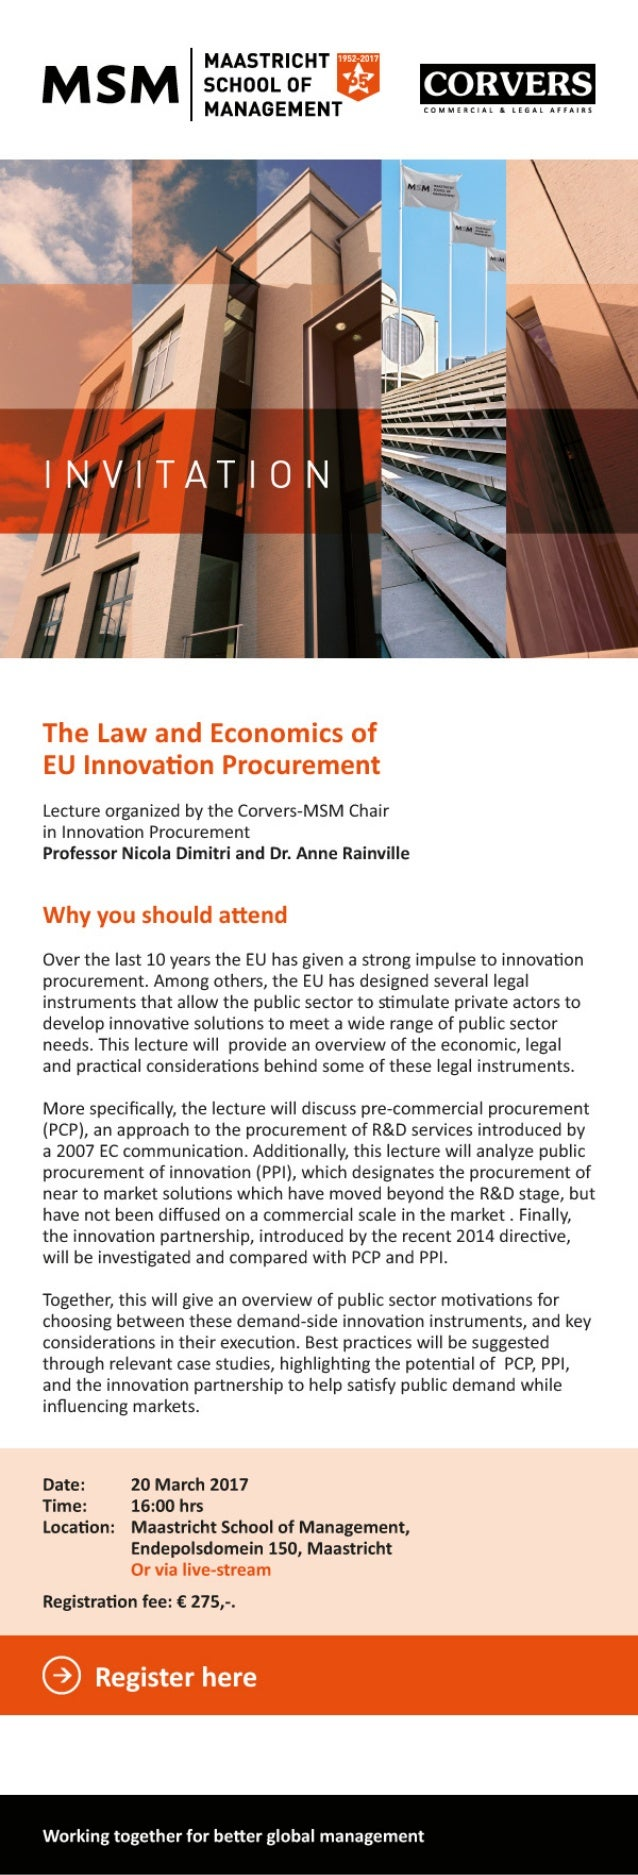 Invitation lecture The law and Economics of EU Innovation Procurement